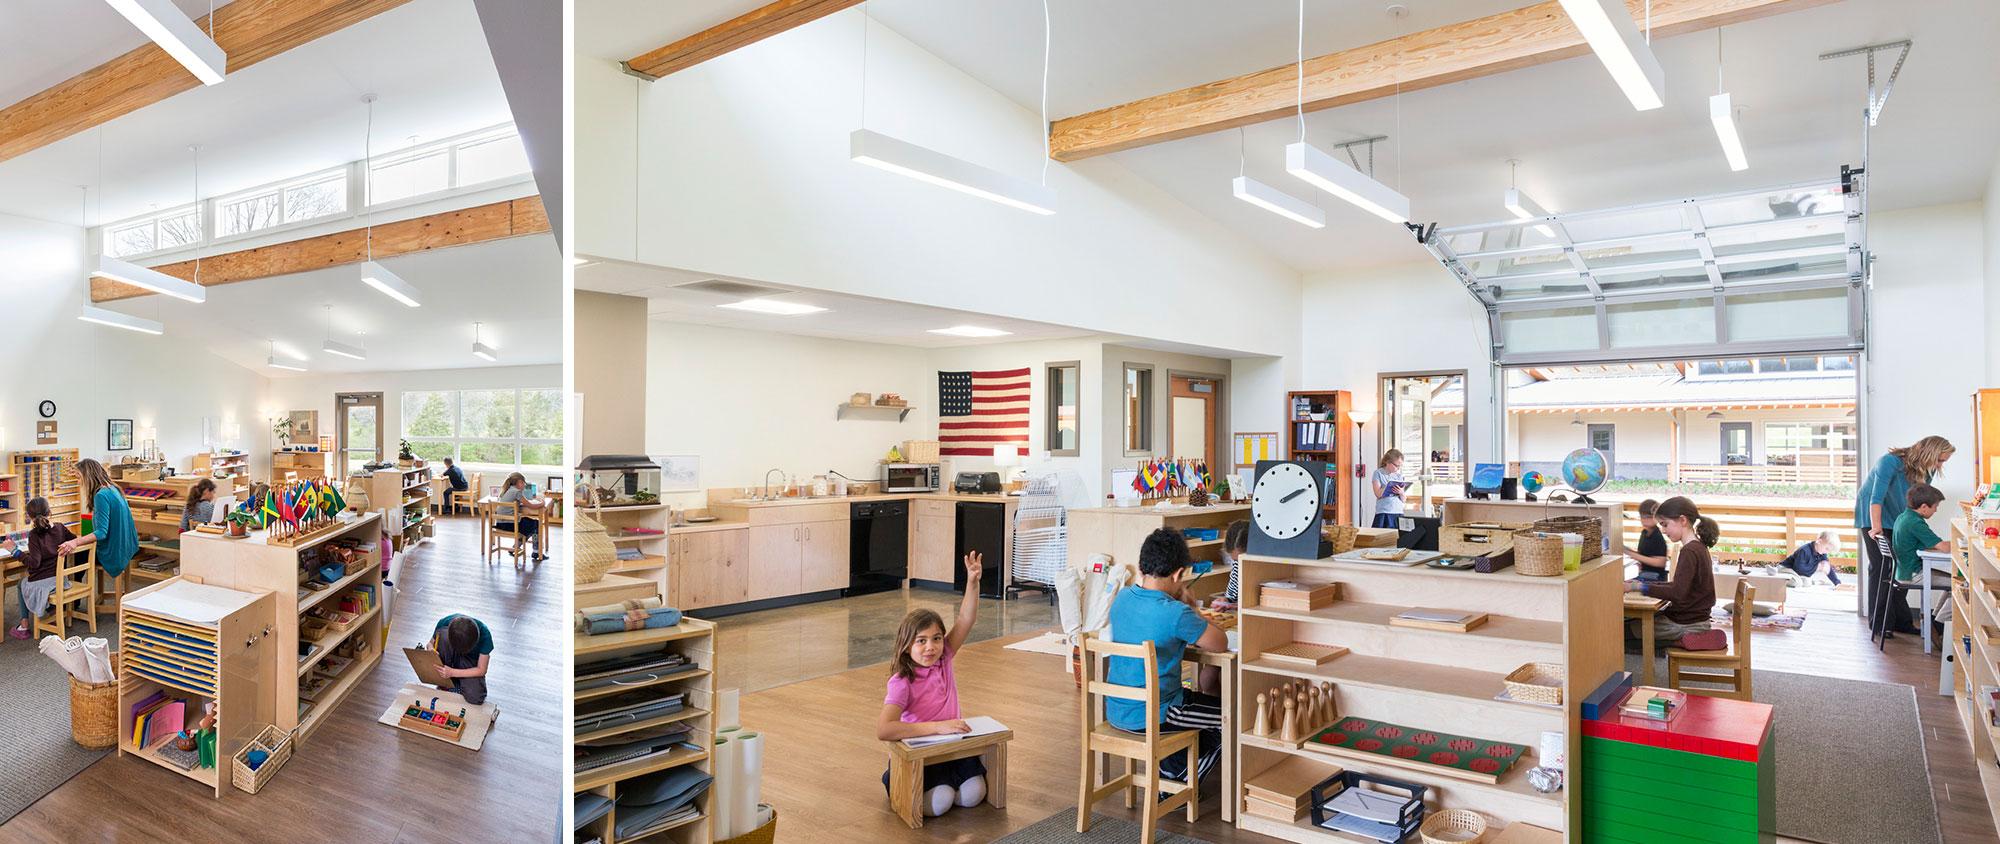 Holy Trinity Montessori